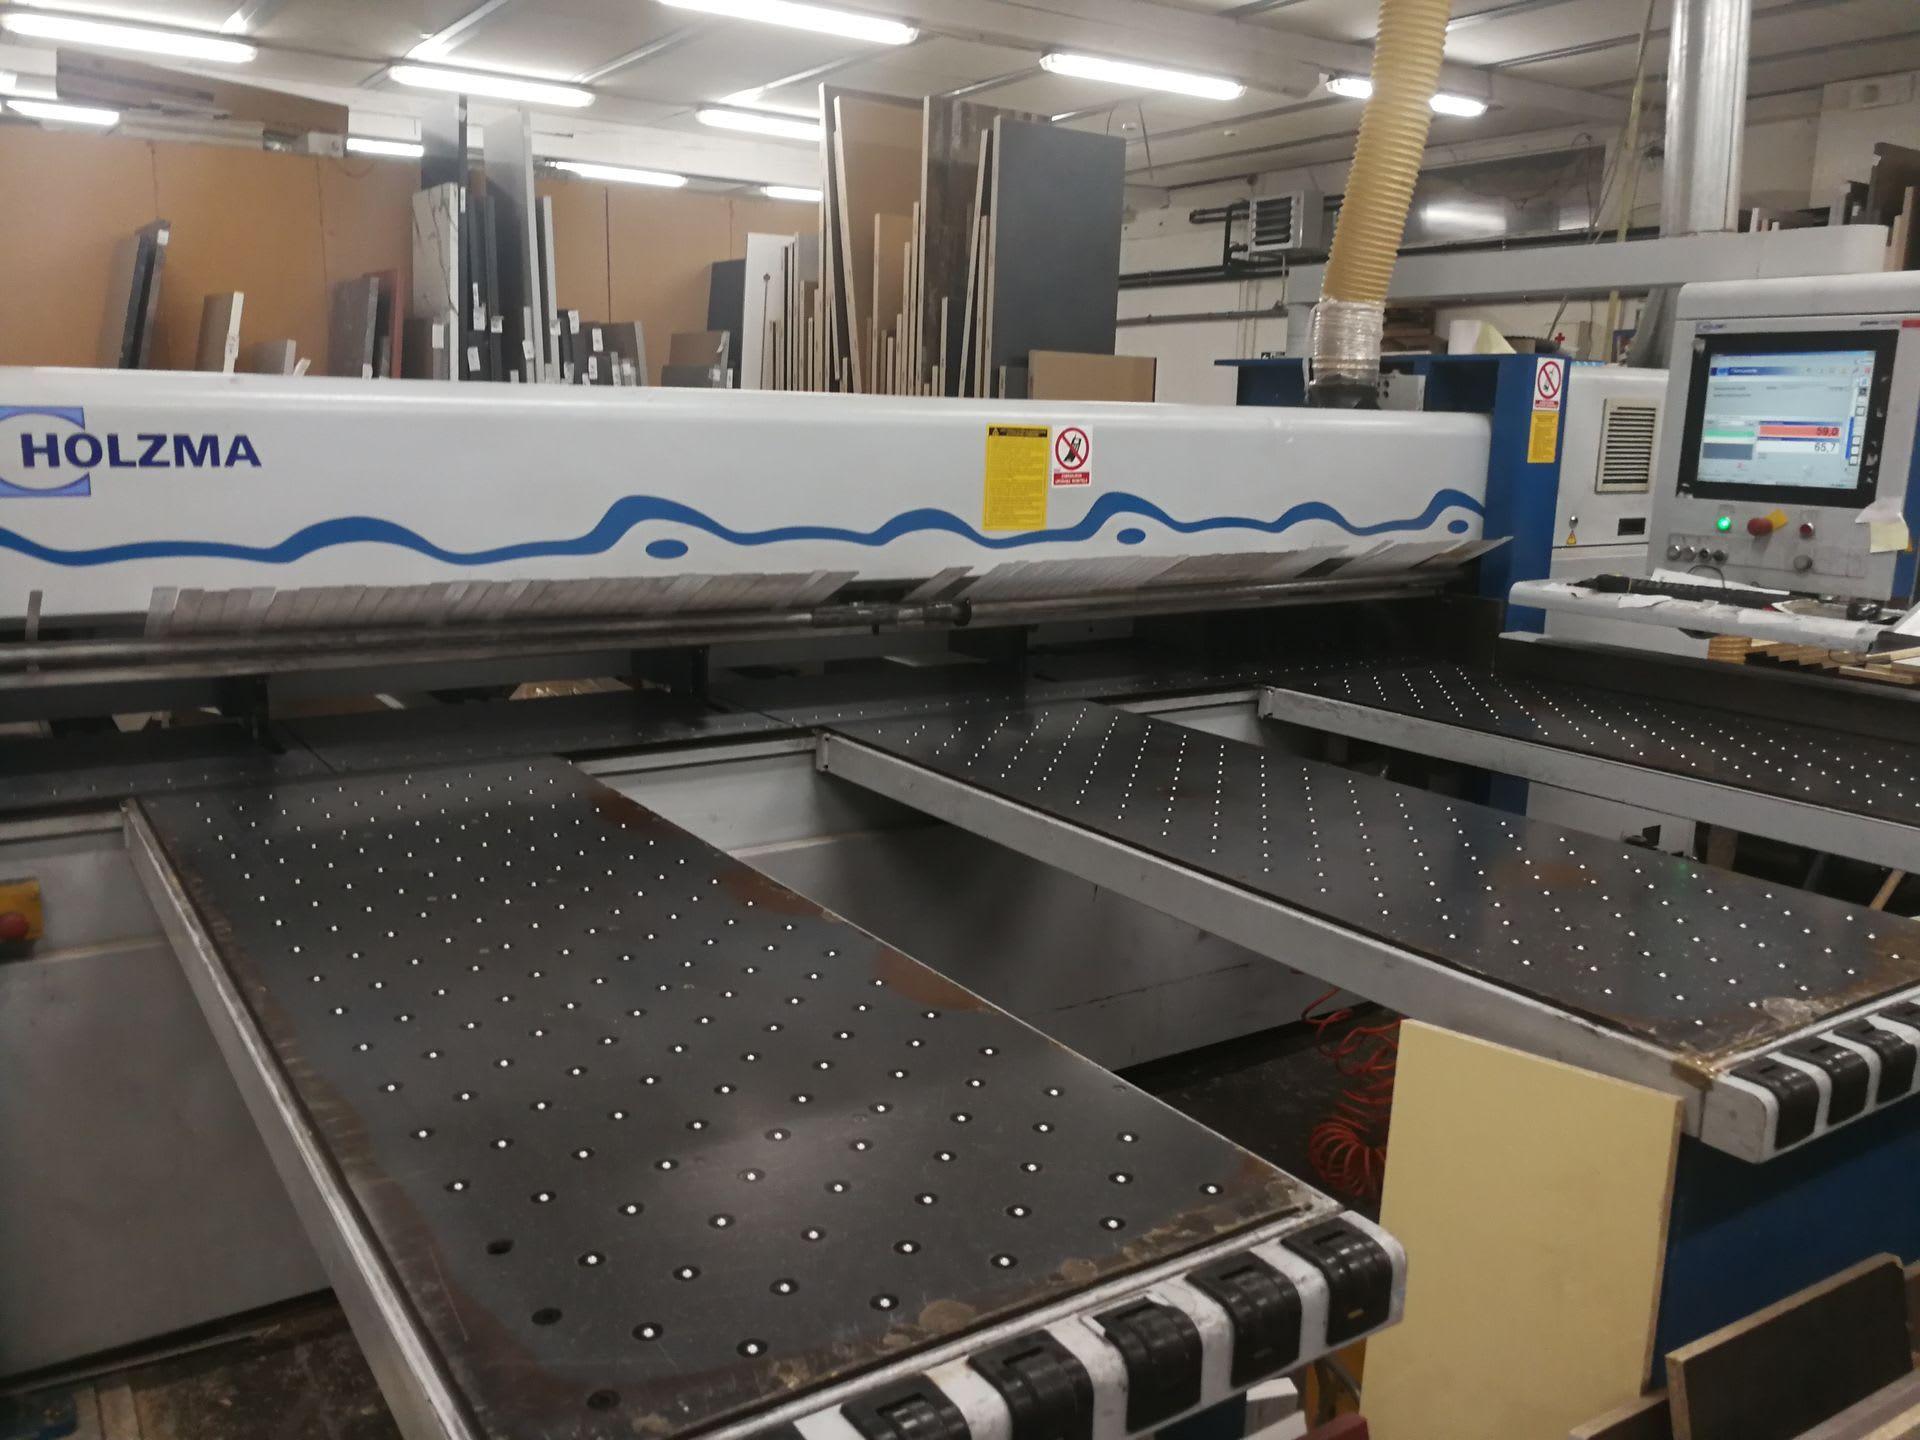 HOLZMA OPT HPP350 / 31 / 31 Plattensäge